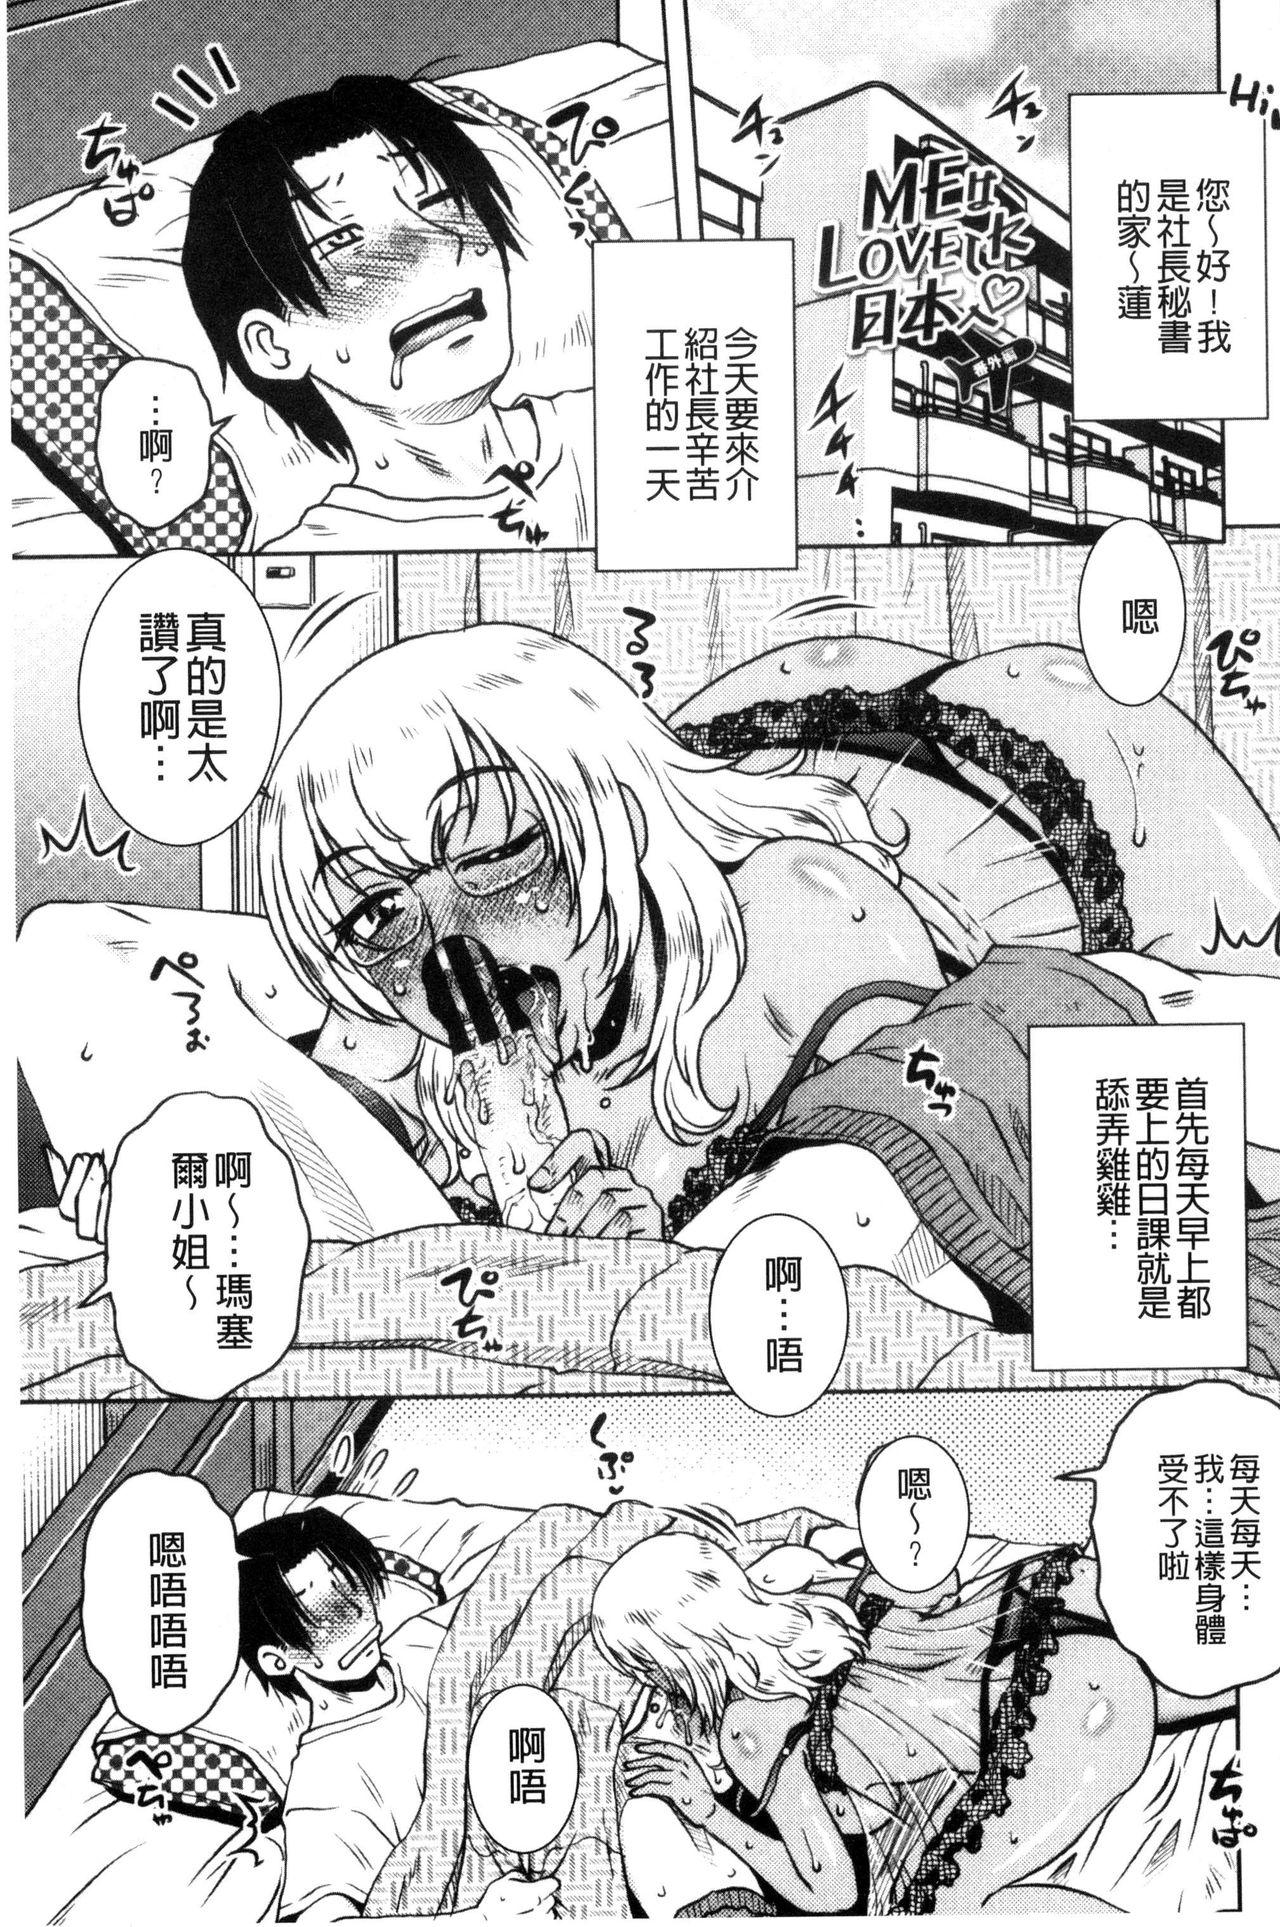 [Kurumiya Mashimin] Uchi no Shachou no Hamedere Inkatsu - Our President is HAME-DERE in Licentious sex life. [Chinese] 187